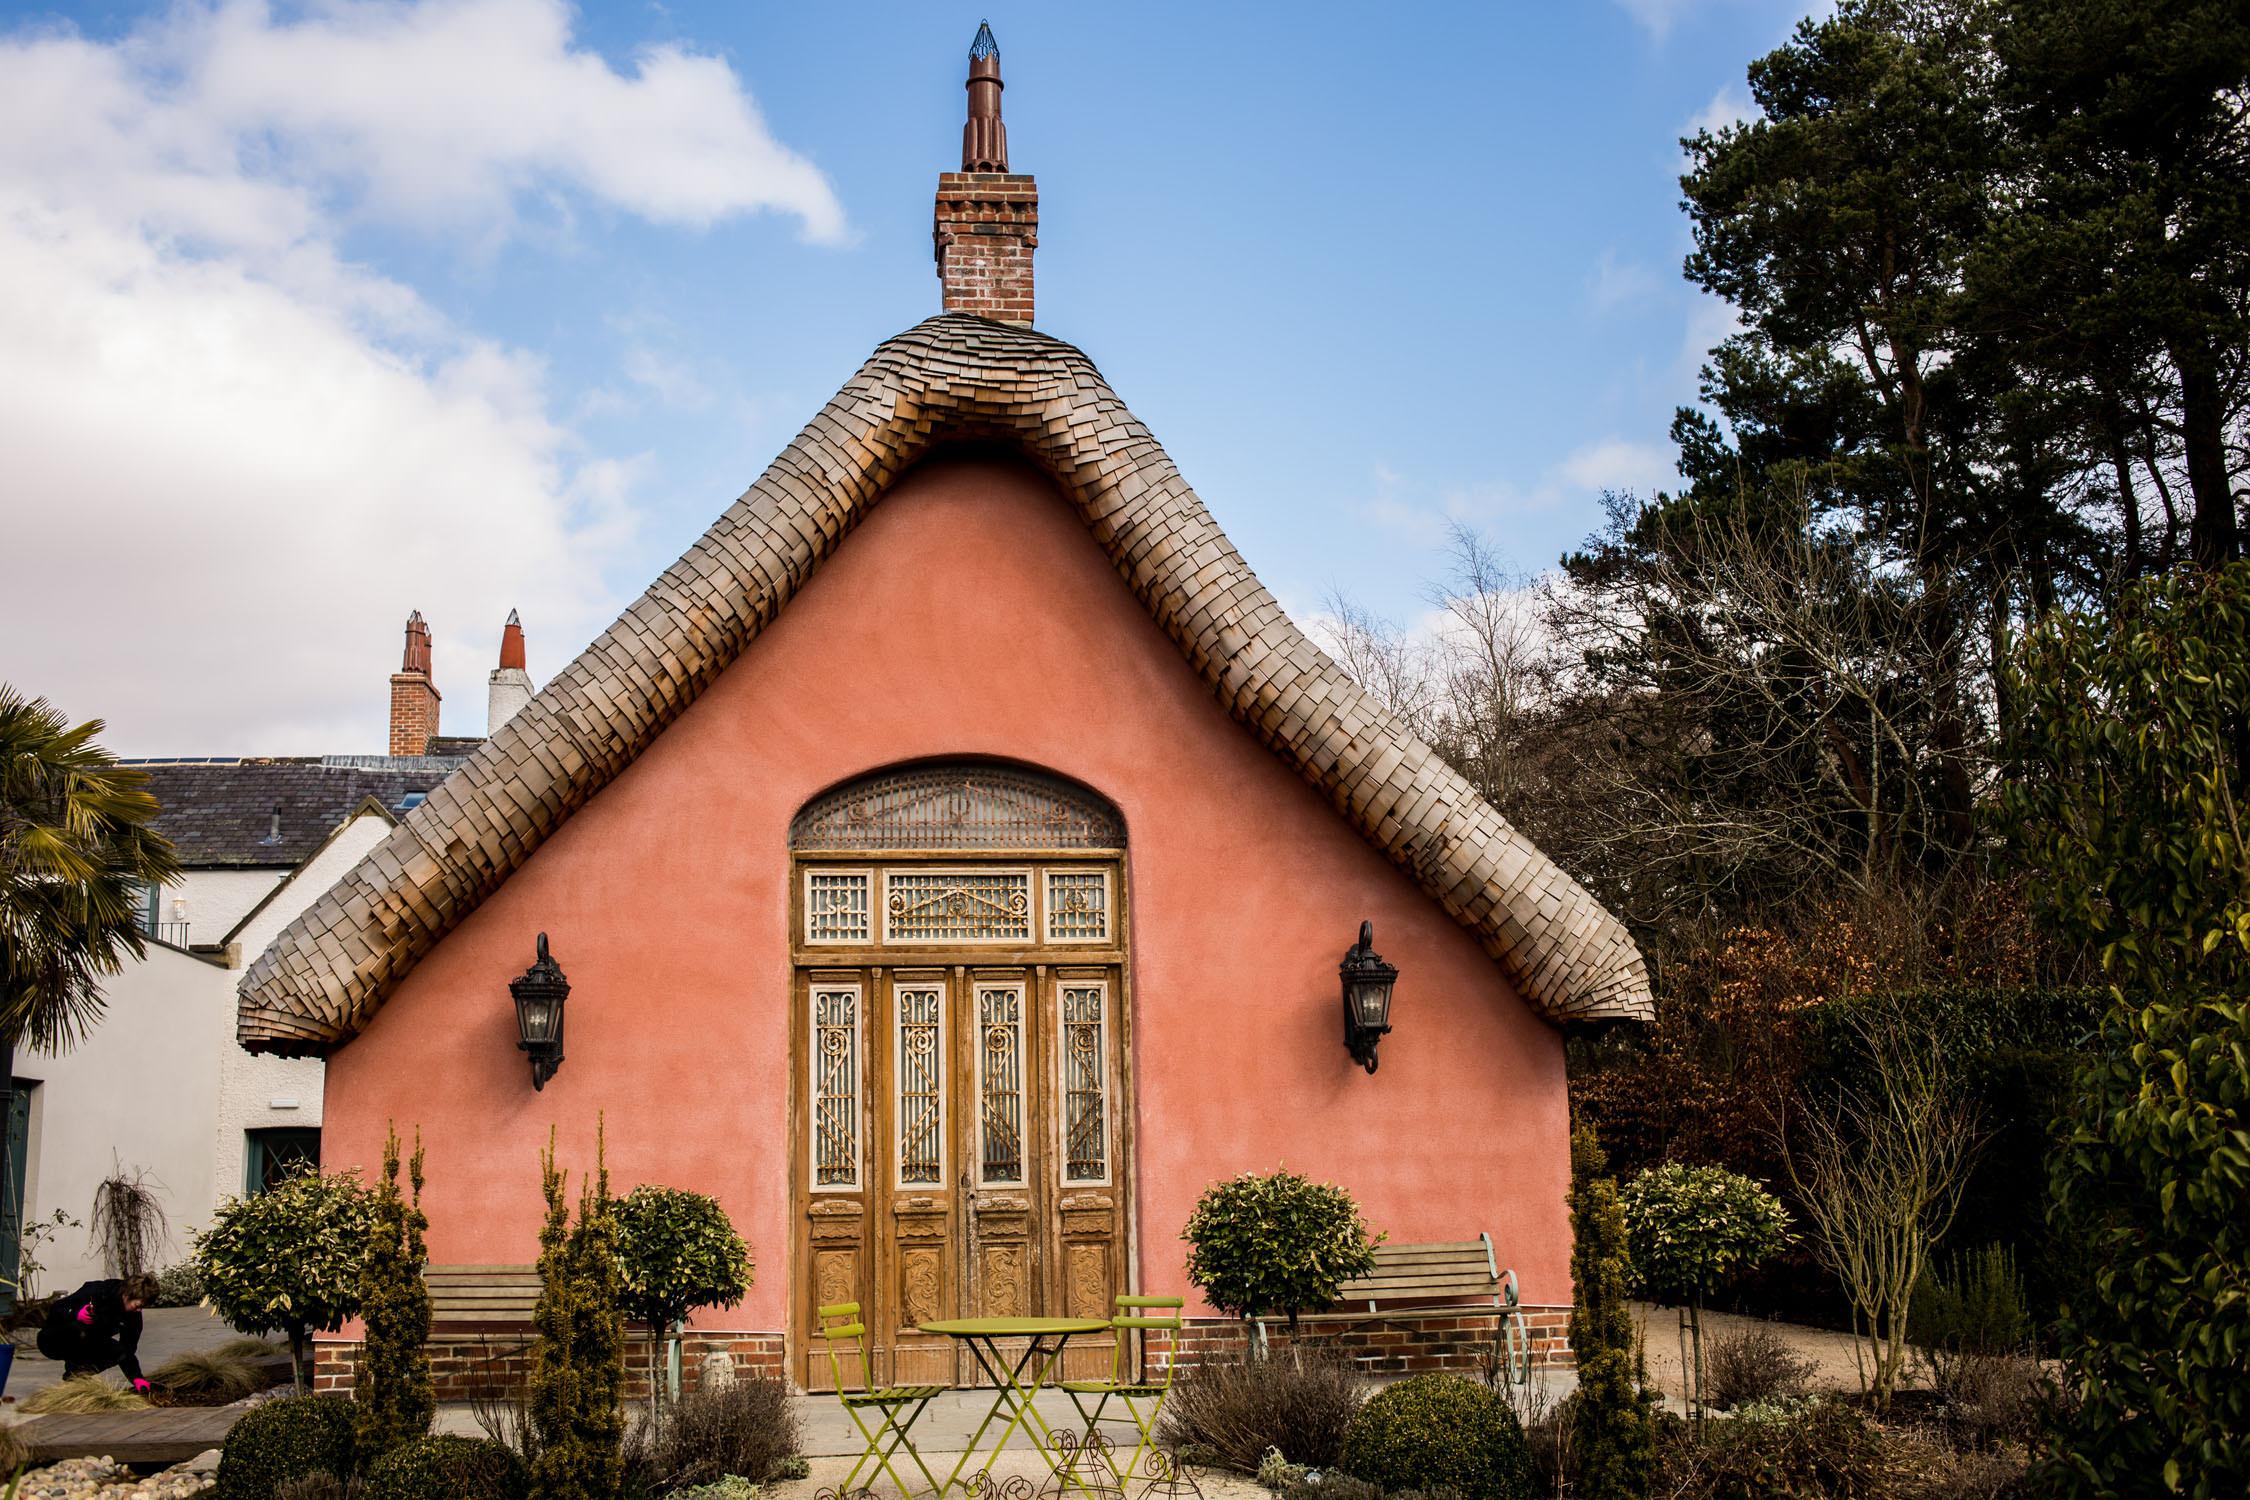 Le Petit Chateau Wedding Gallery